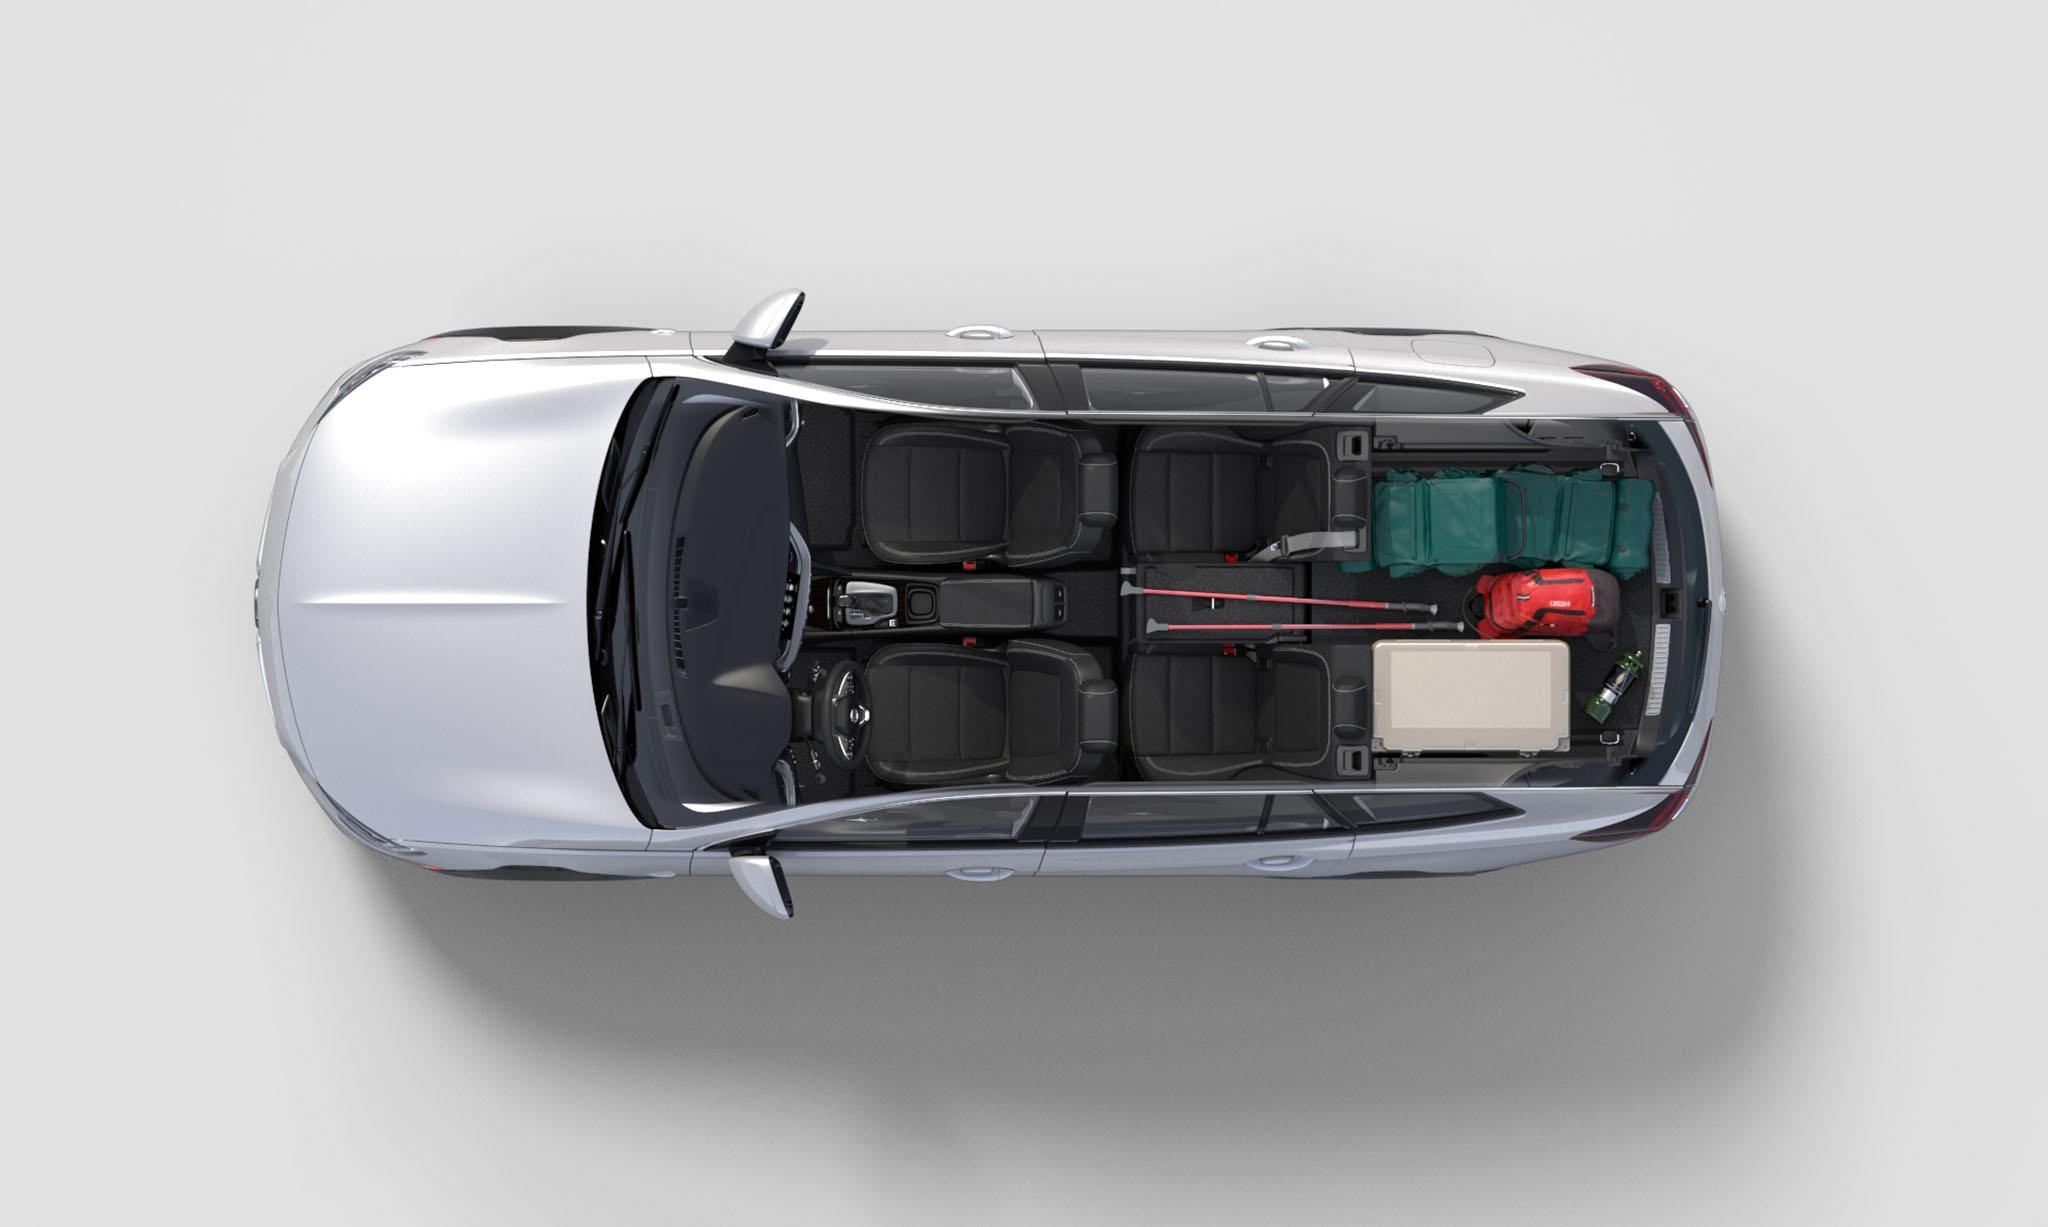 report the 2018 buick regal tourx will msrp for under 30 000 car burst. Black Bedroom Furniture Sets. Home Design Ideas